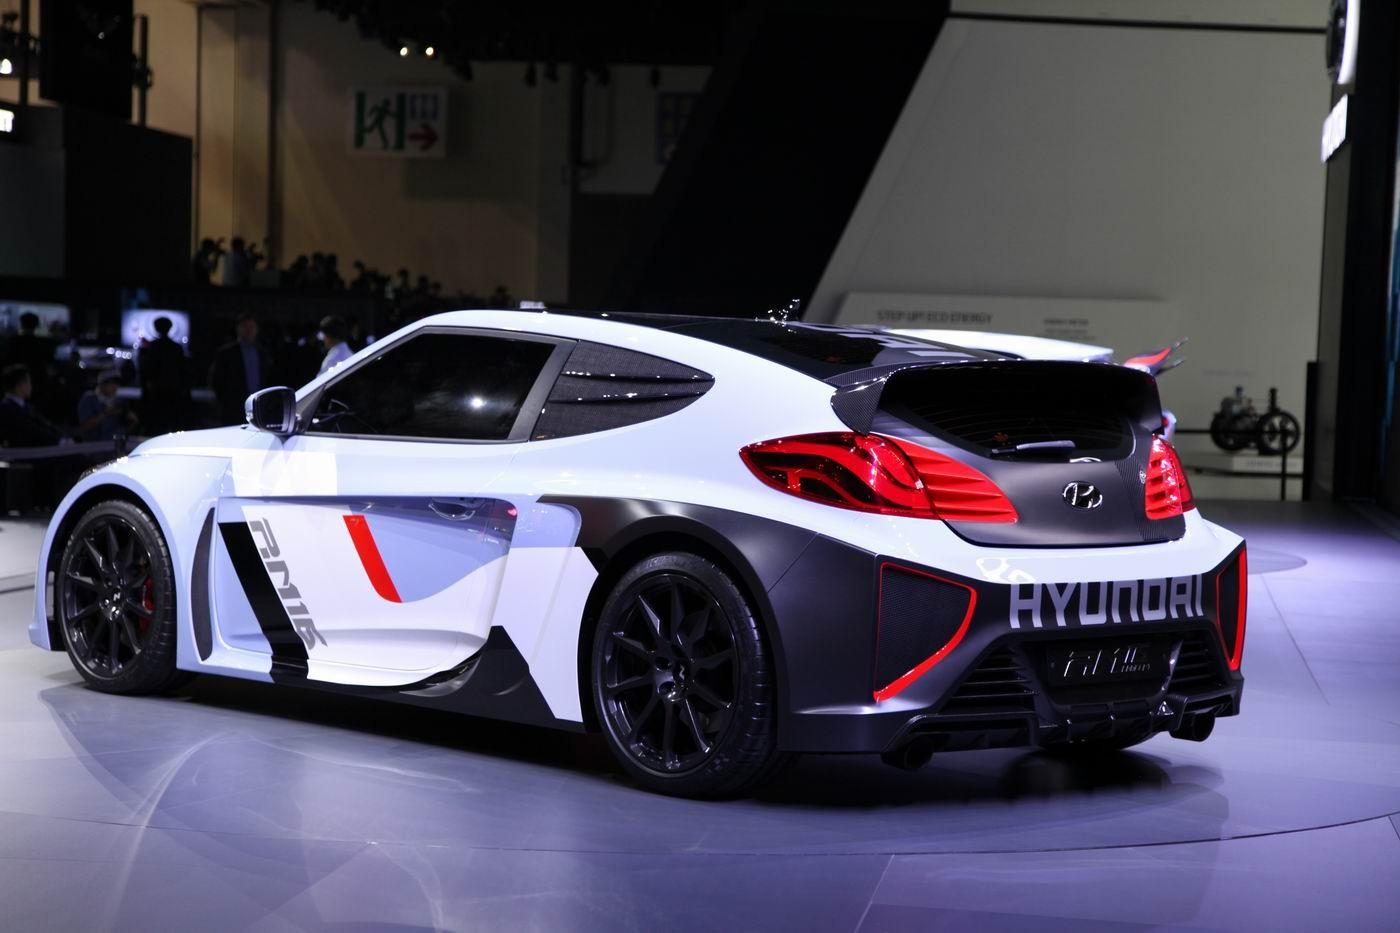 Hyundai Rm16 >> Hyundai представил среднемоторный спорткар